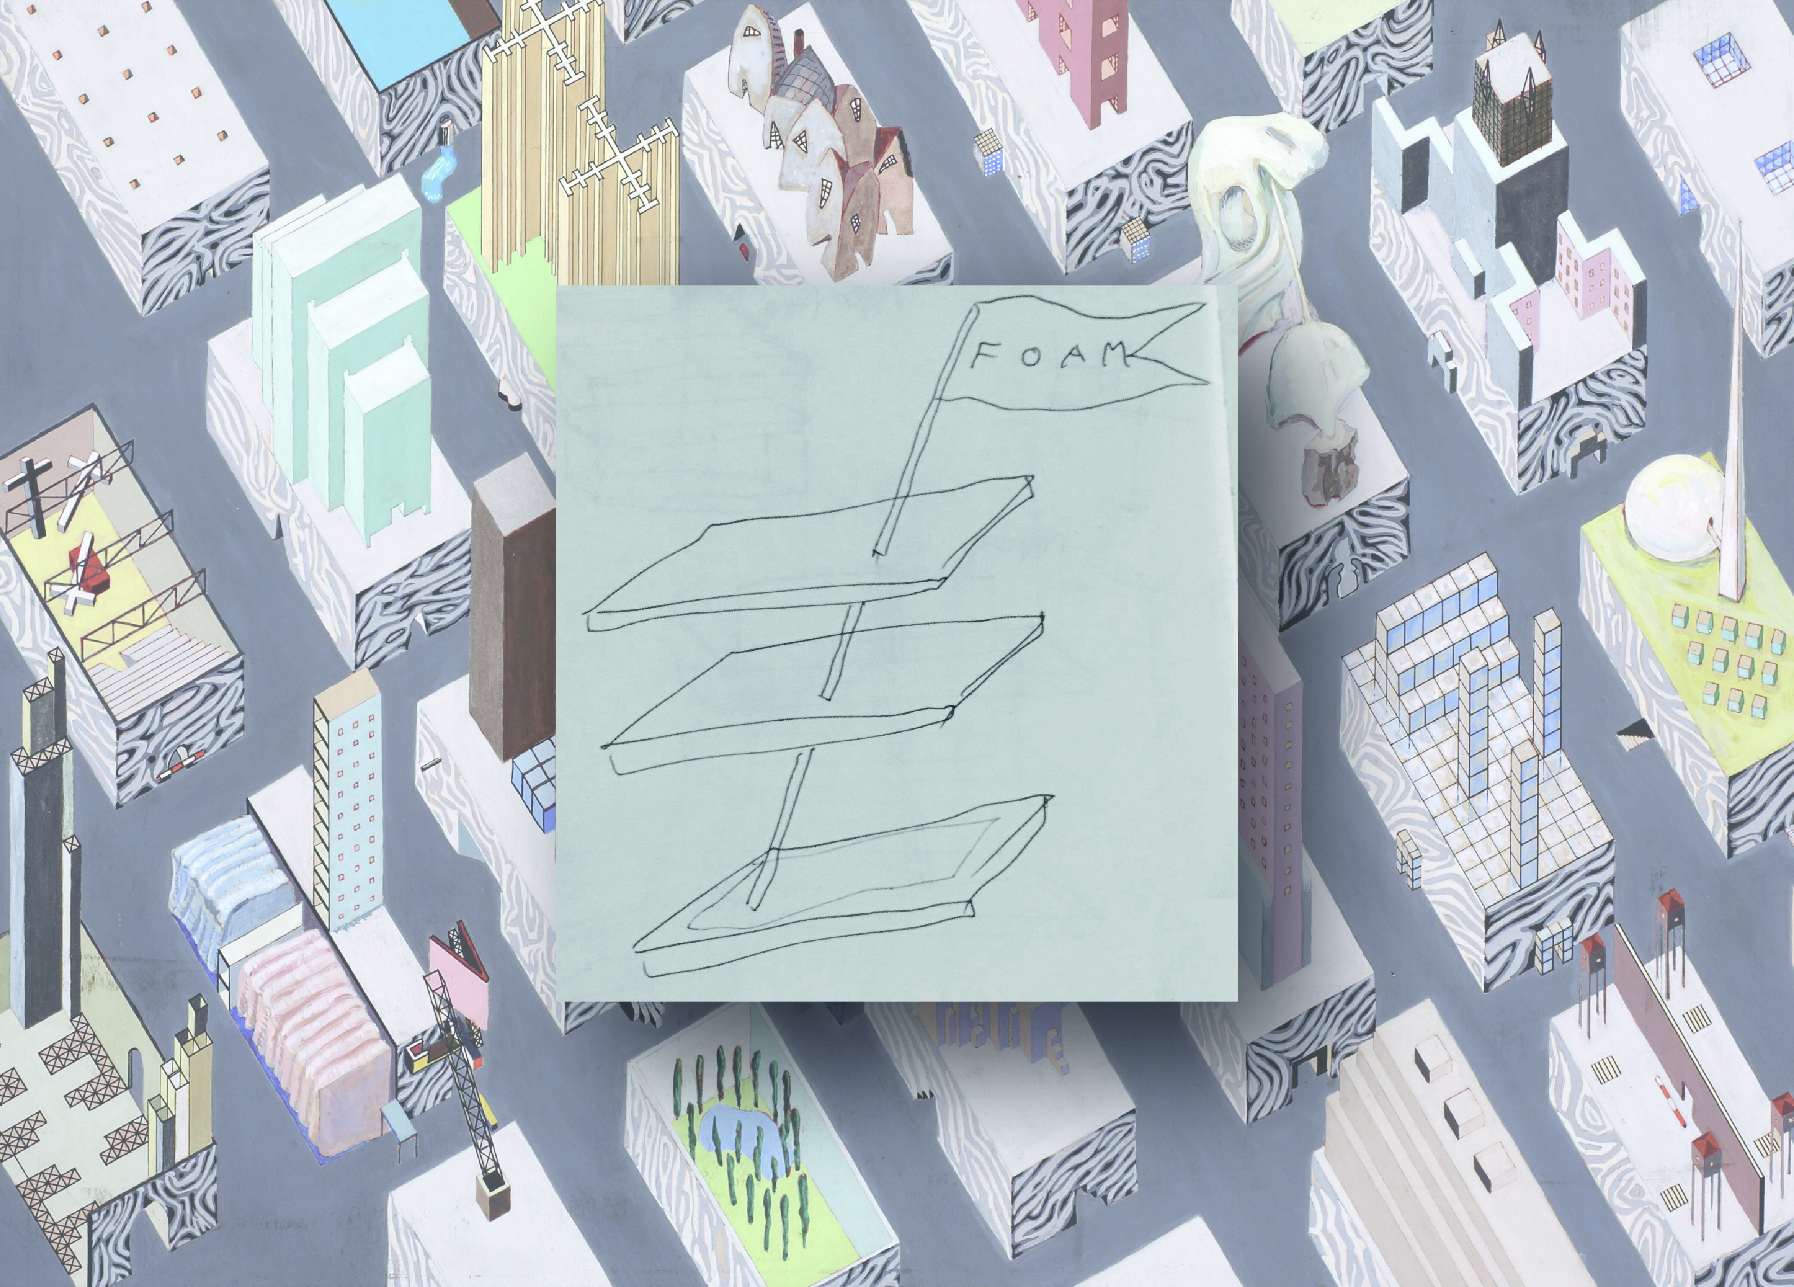 foam postcard-01.jpg